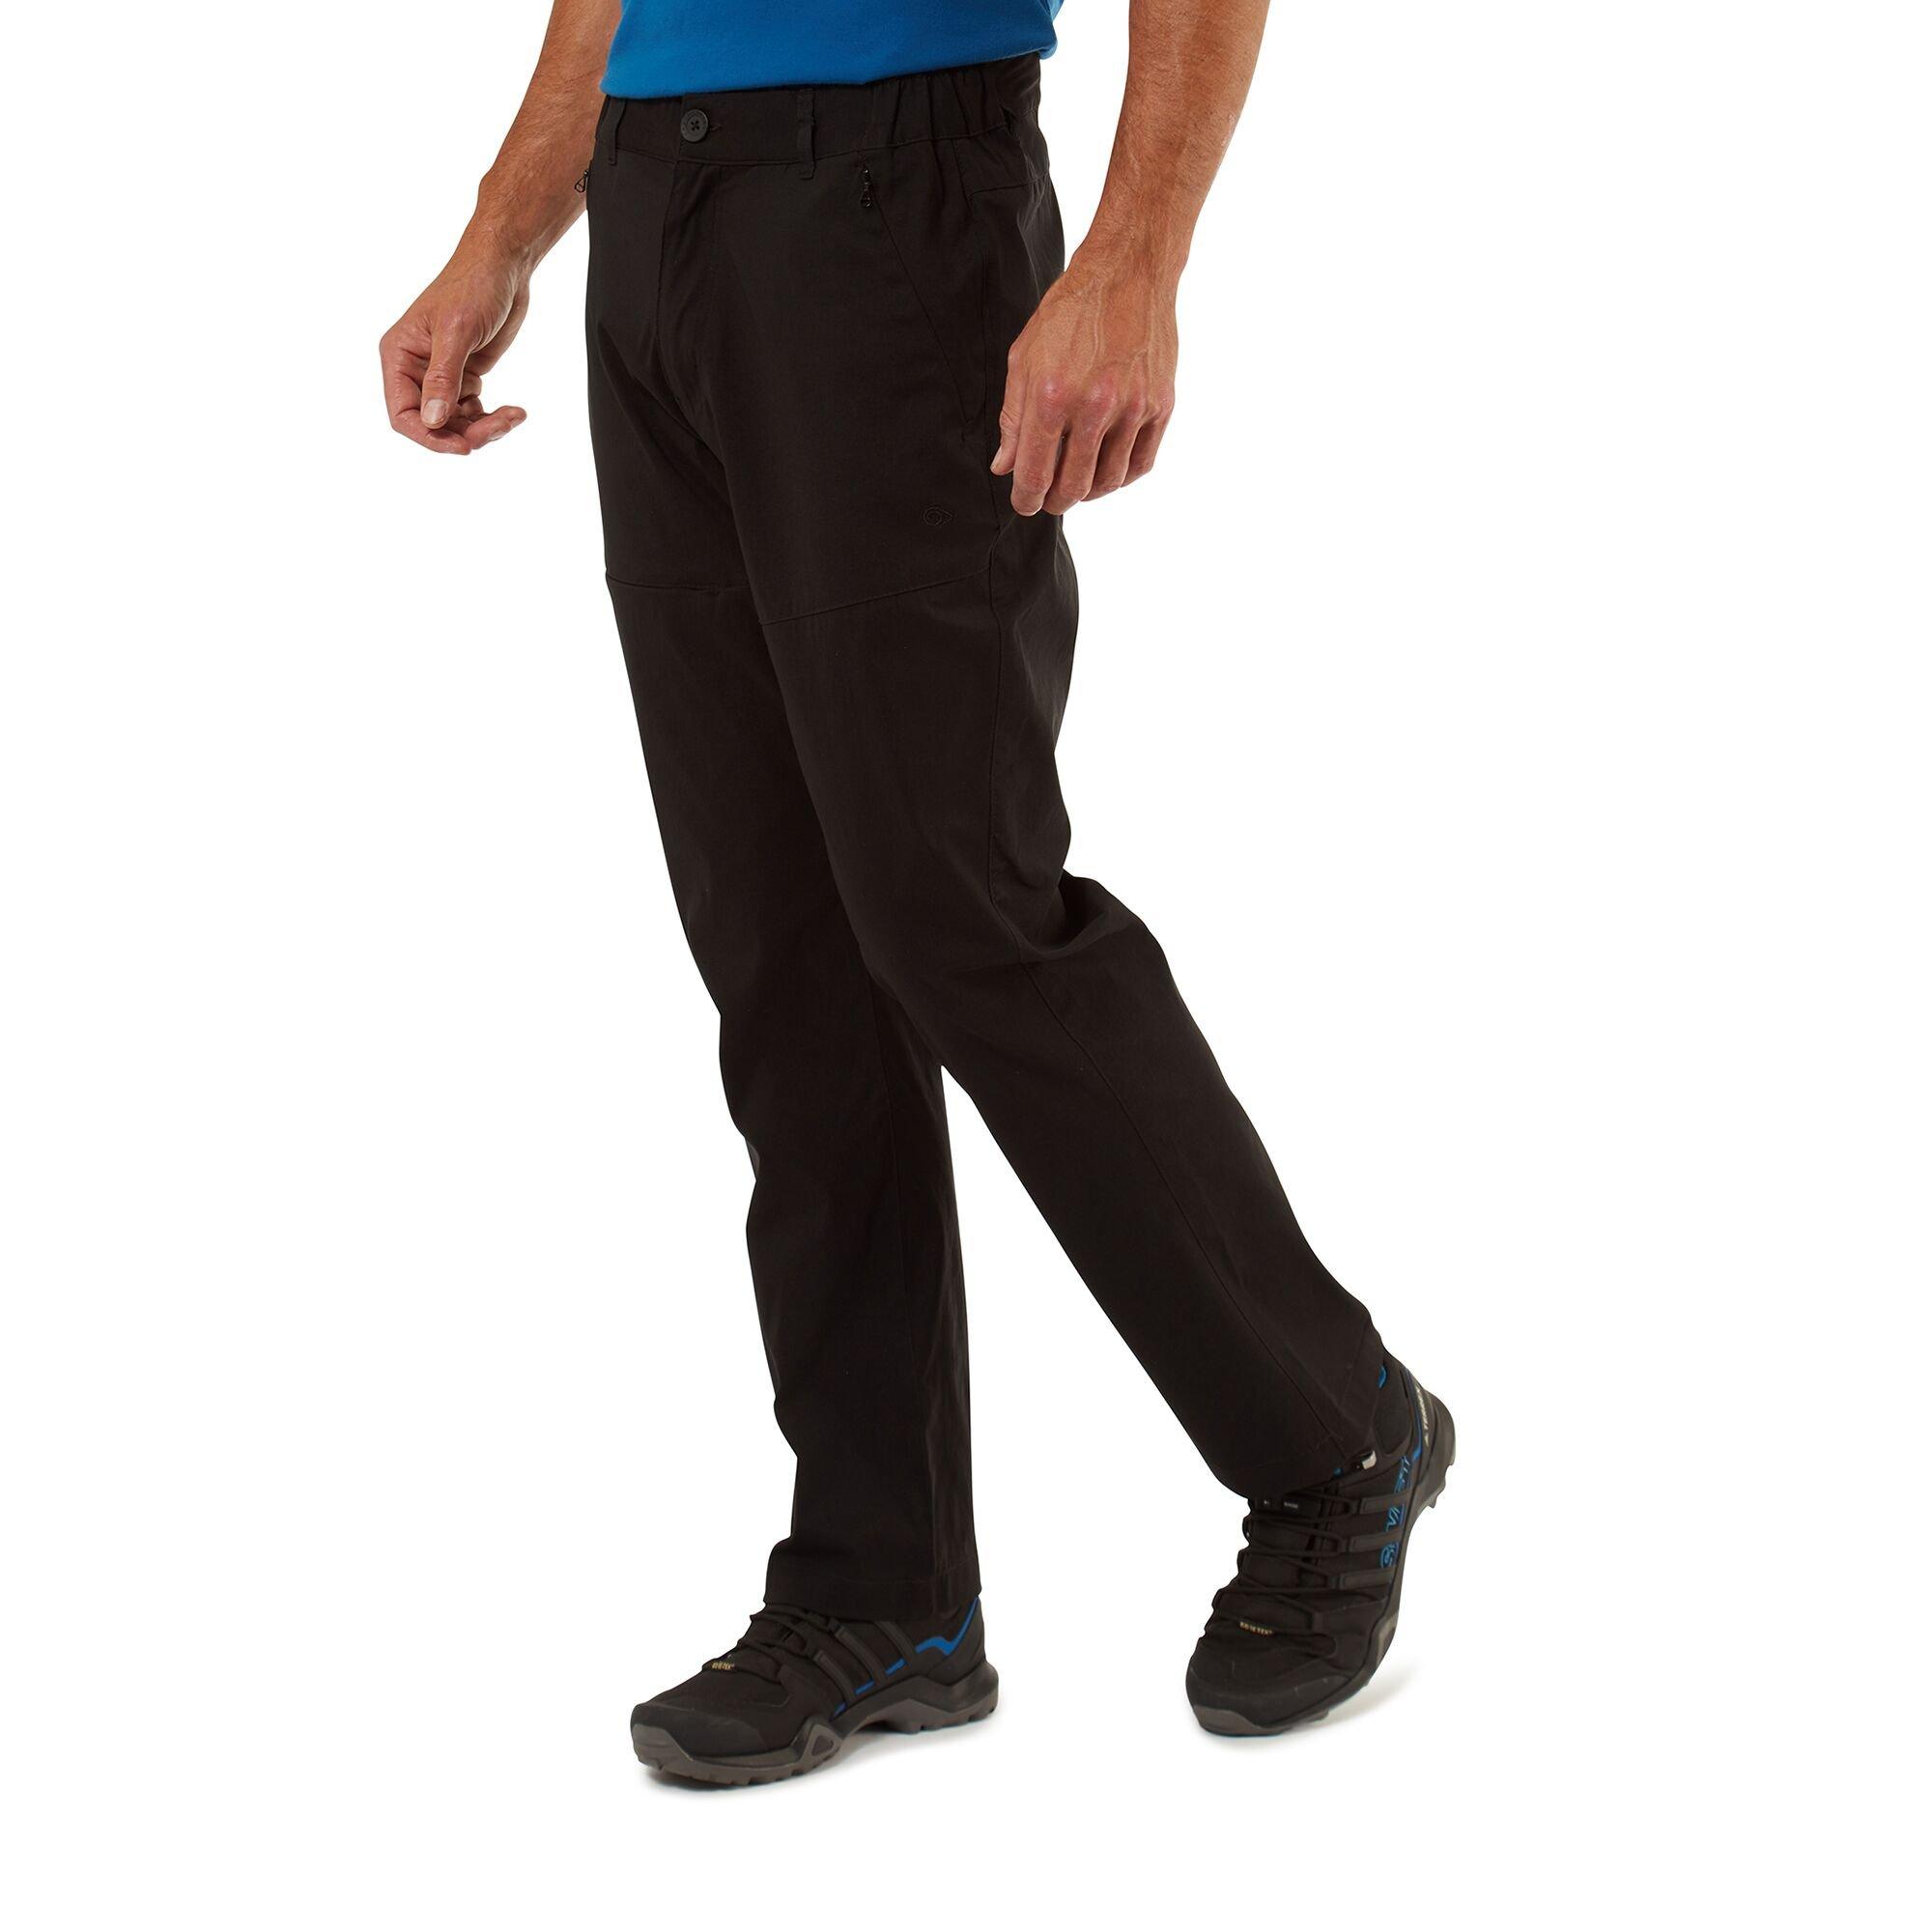 Craghoppers Mens Classic Kiwi Trousers - Bark - 36s